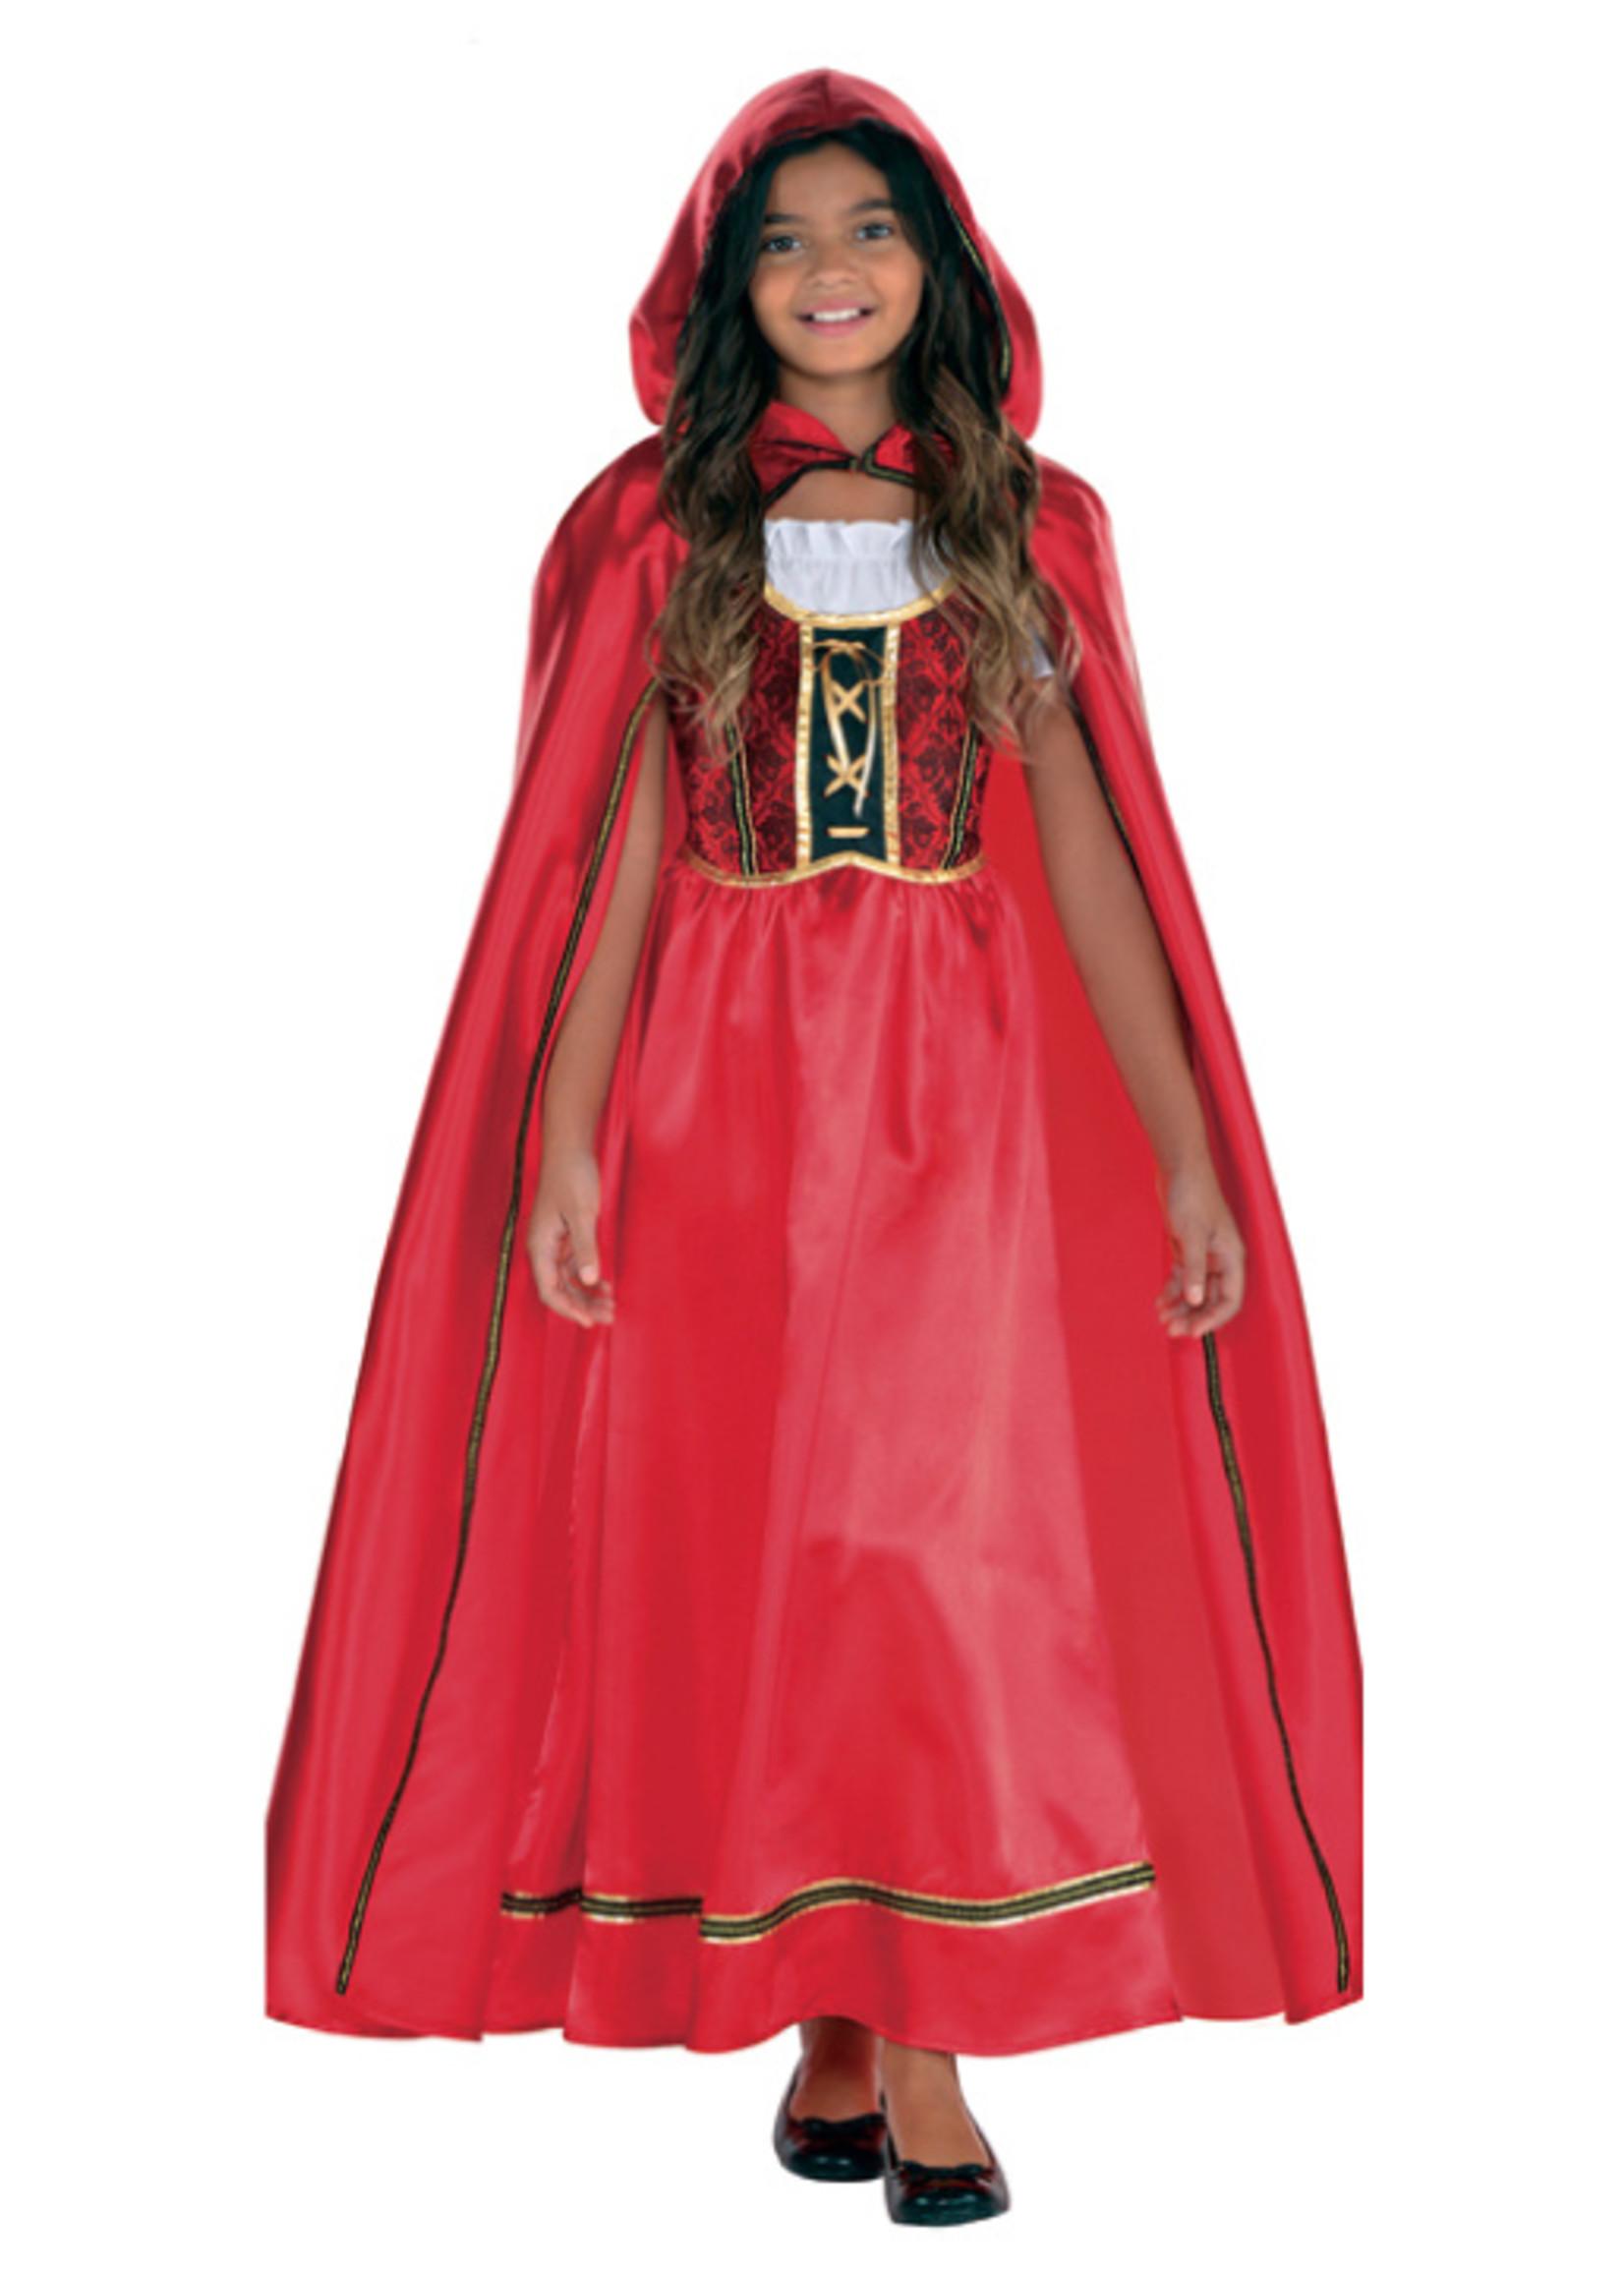 Fairytale Red Ridding Hood Costume - Girls